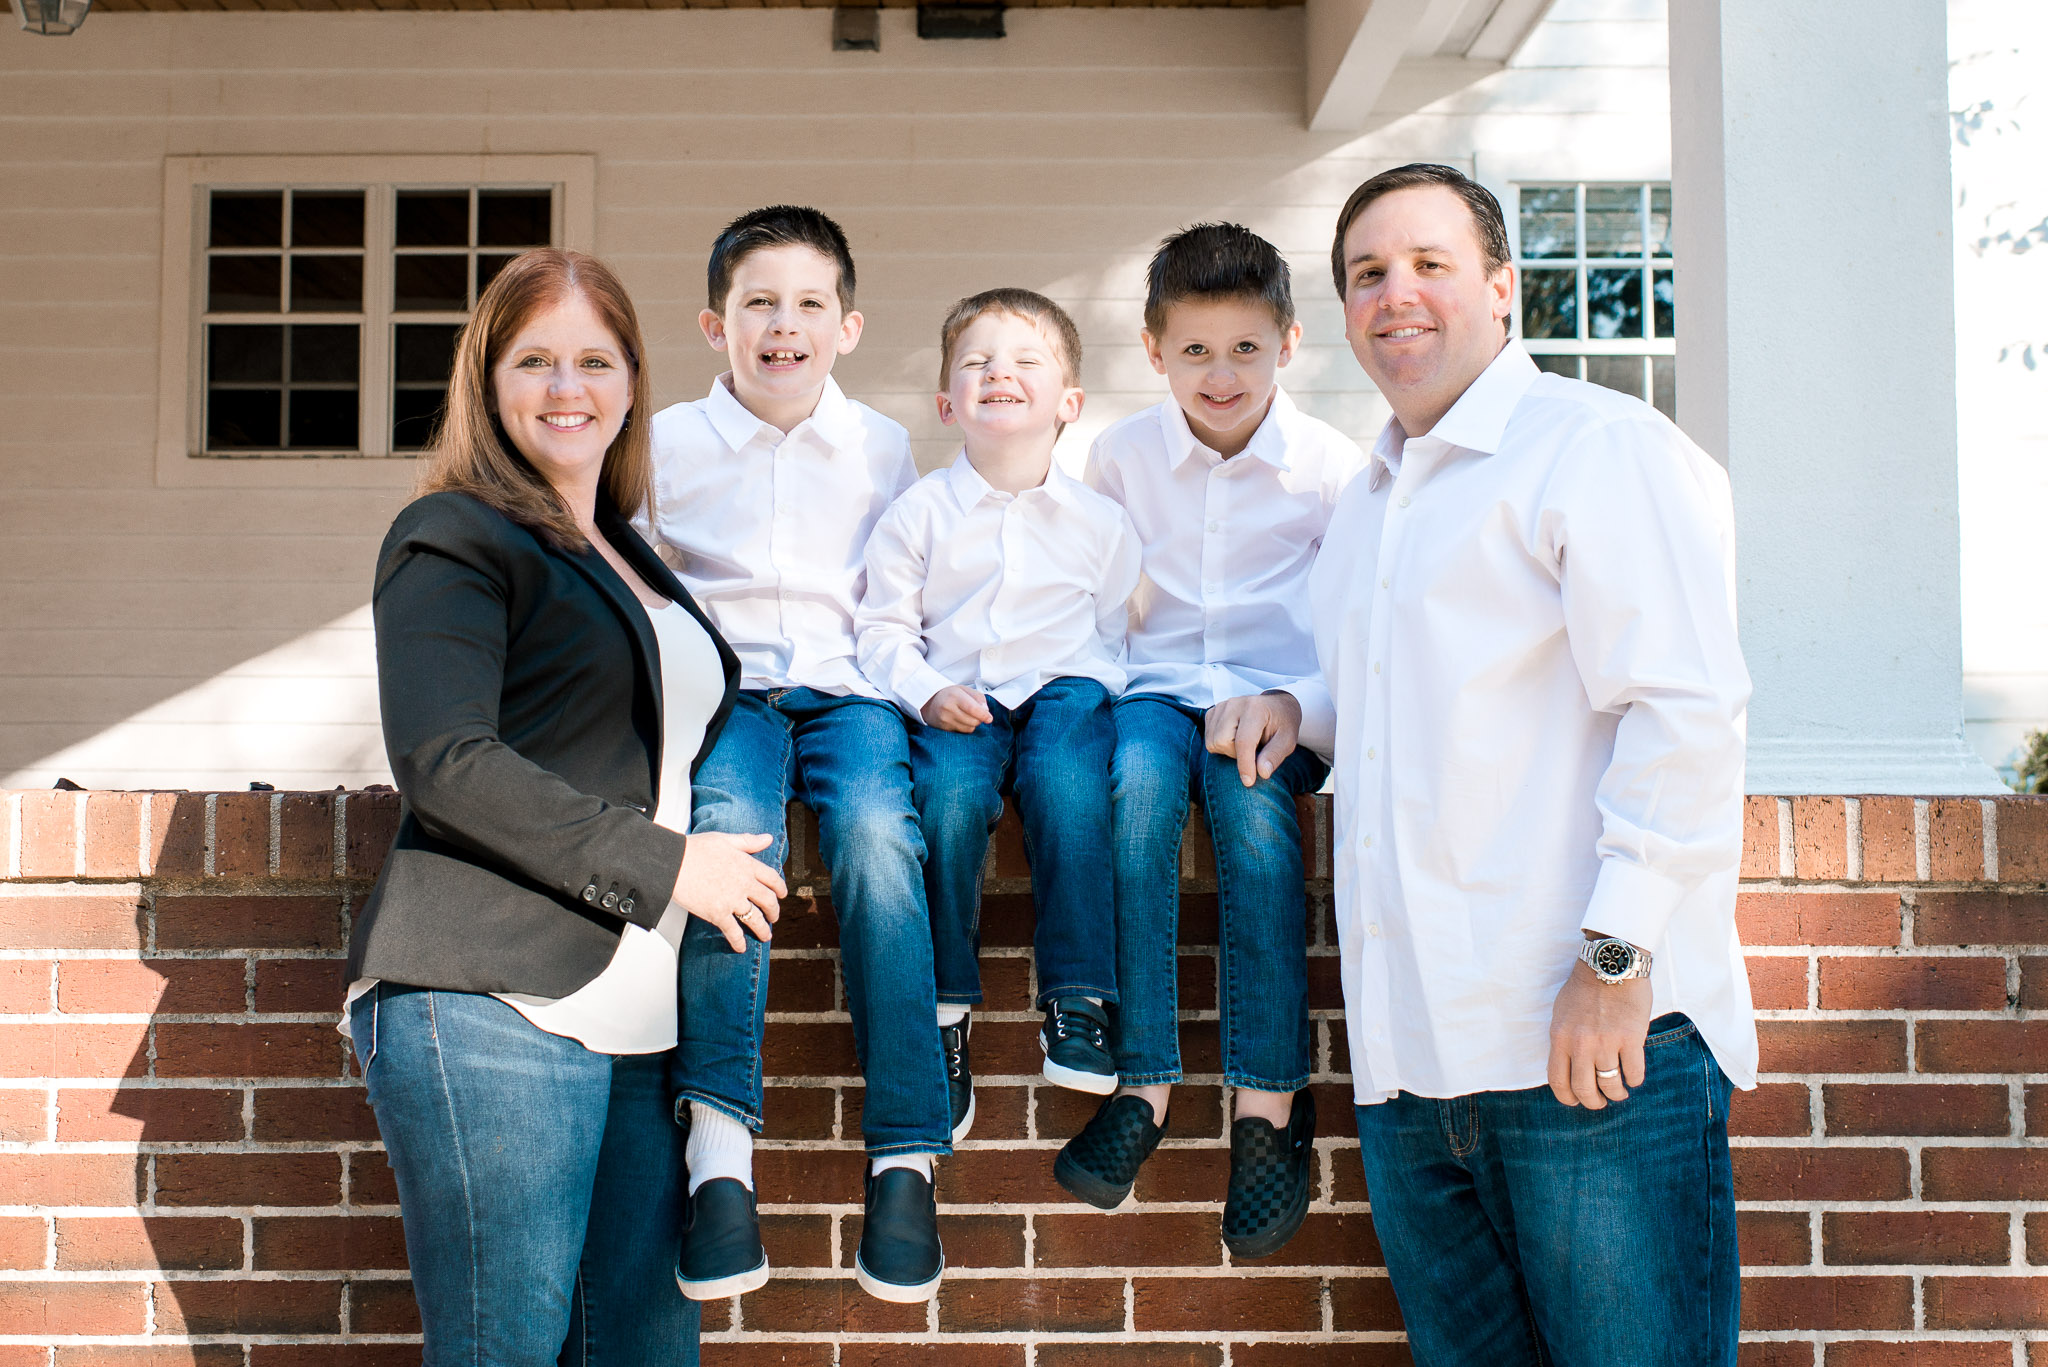 KateTaramykinStudios-Orlando-Family-Photographer-Keenan-7.jpg